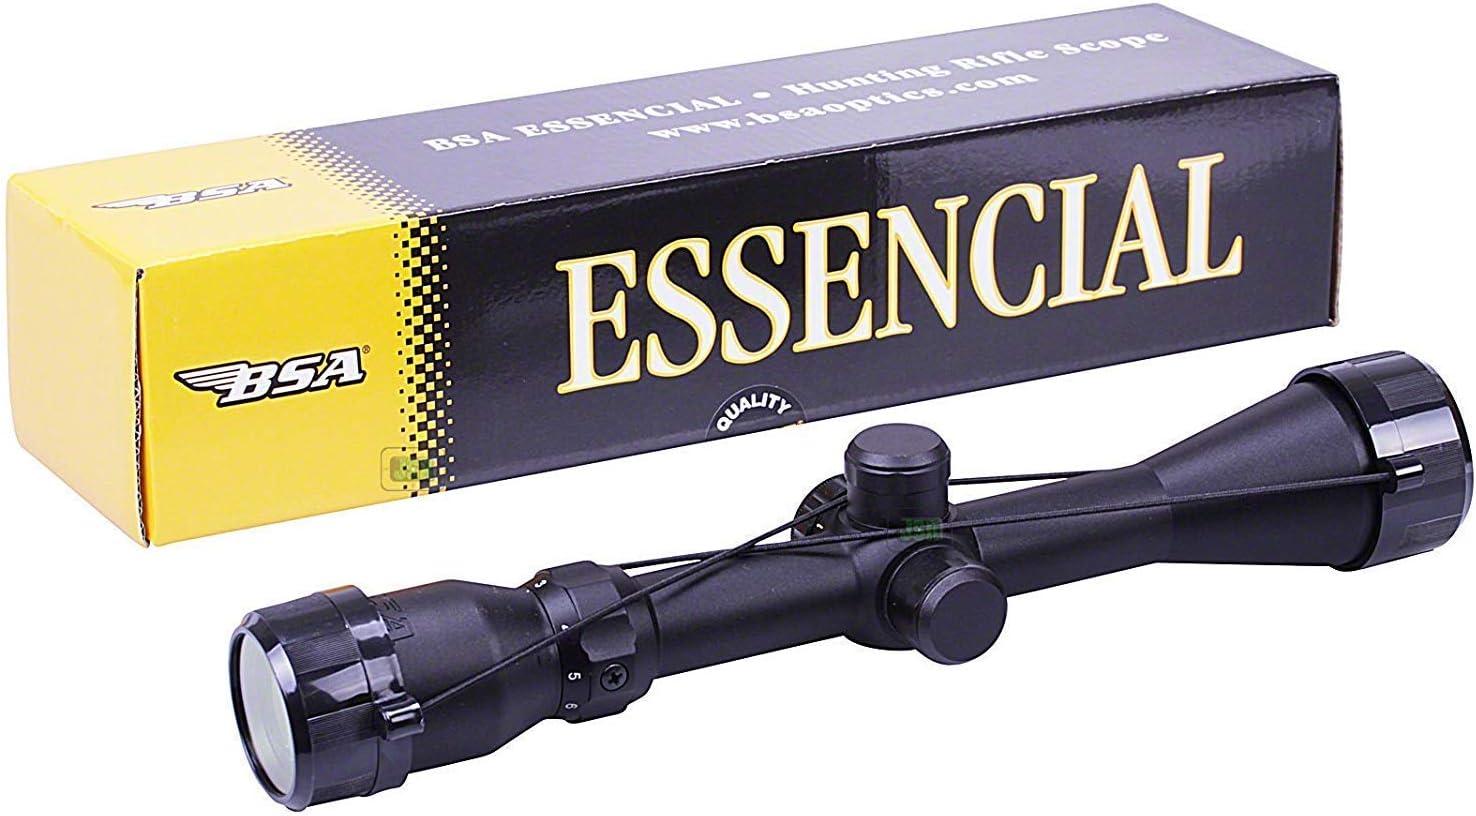 BSA 3-9x40 Ir Esencial Telescópico Iluminado Mil Dot Pistola de Aire Rifle Scope